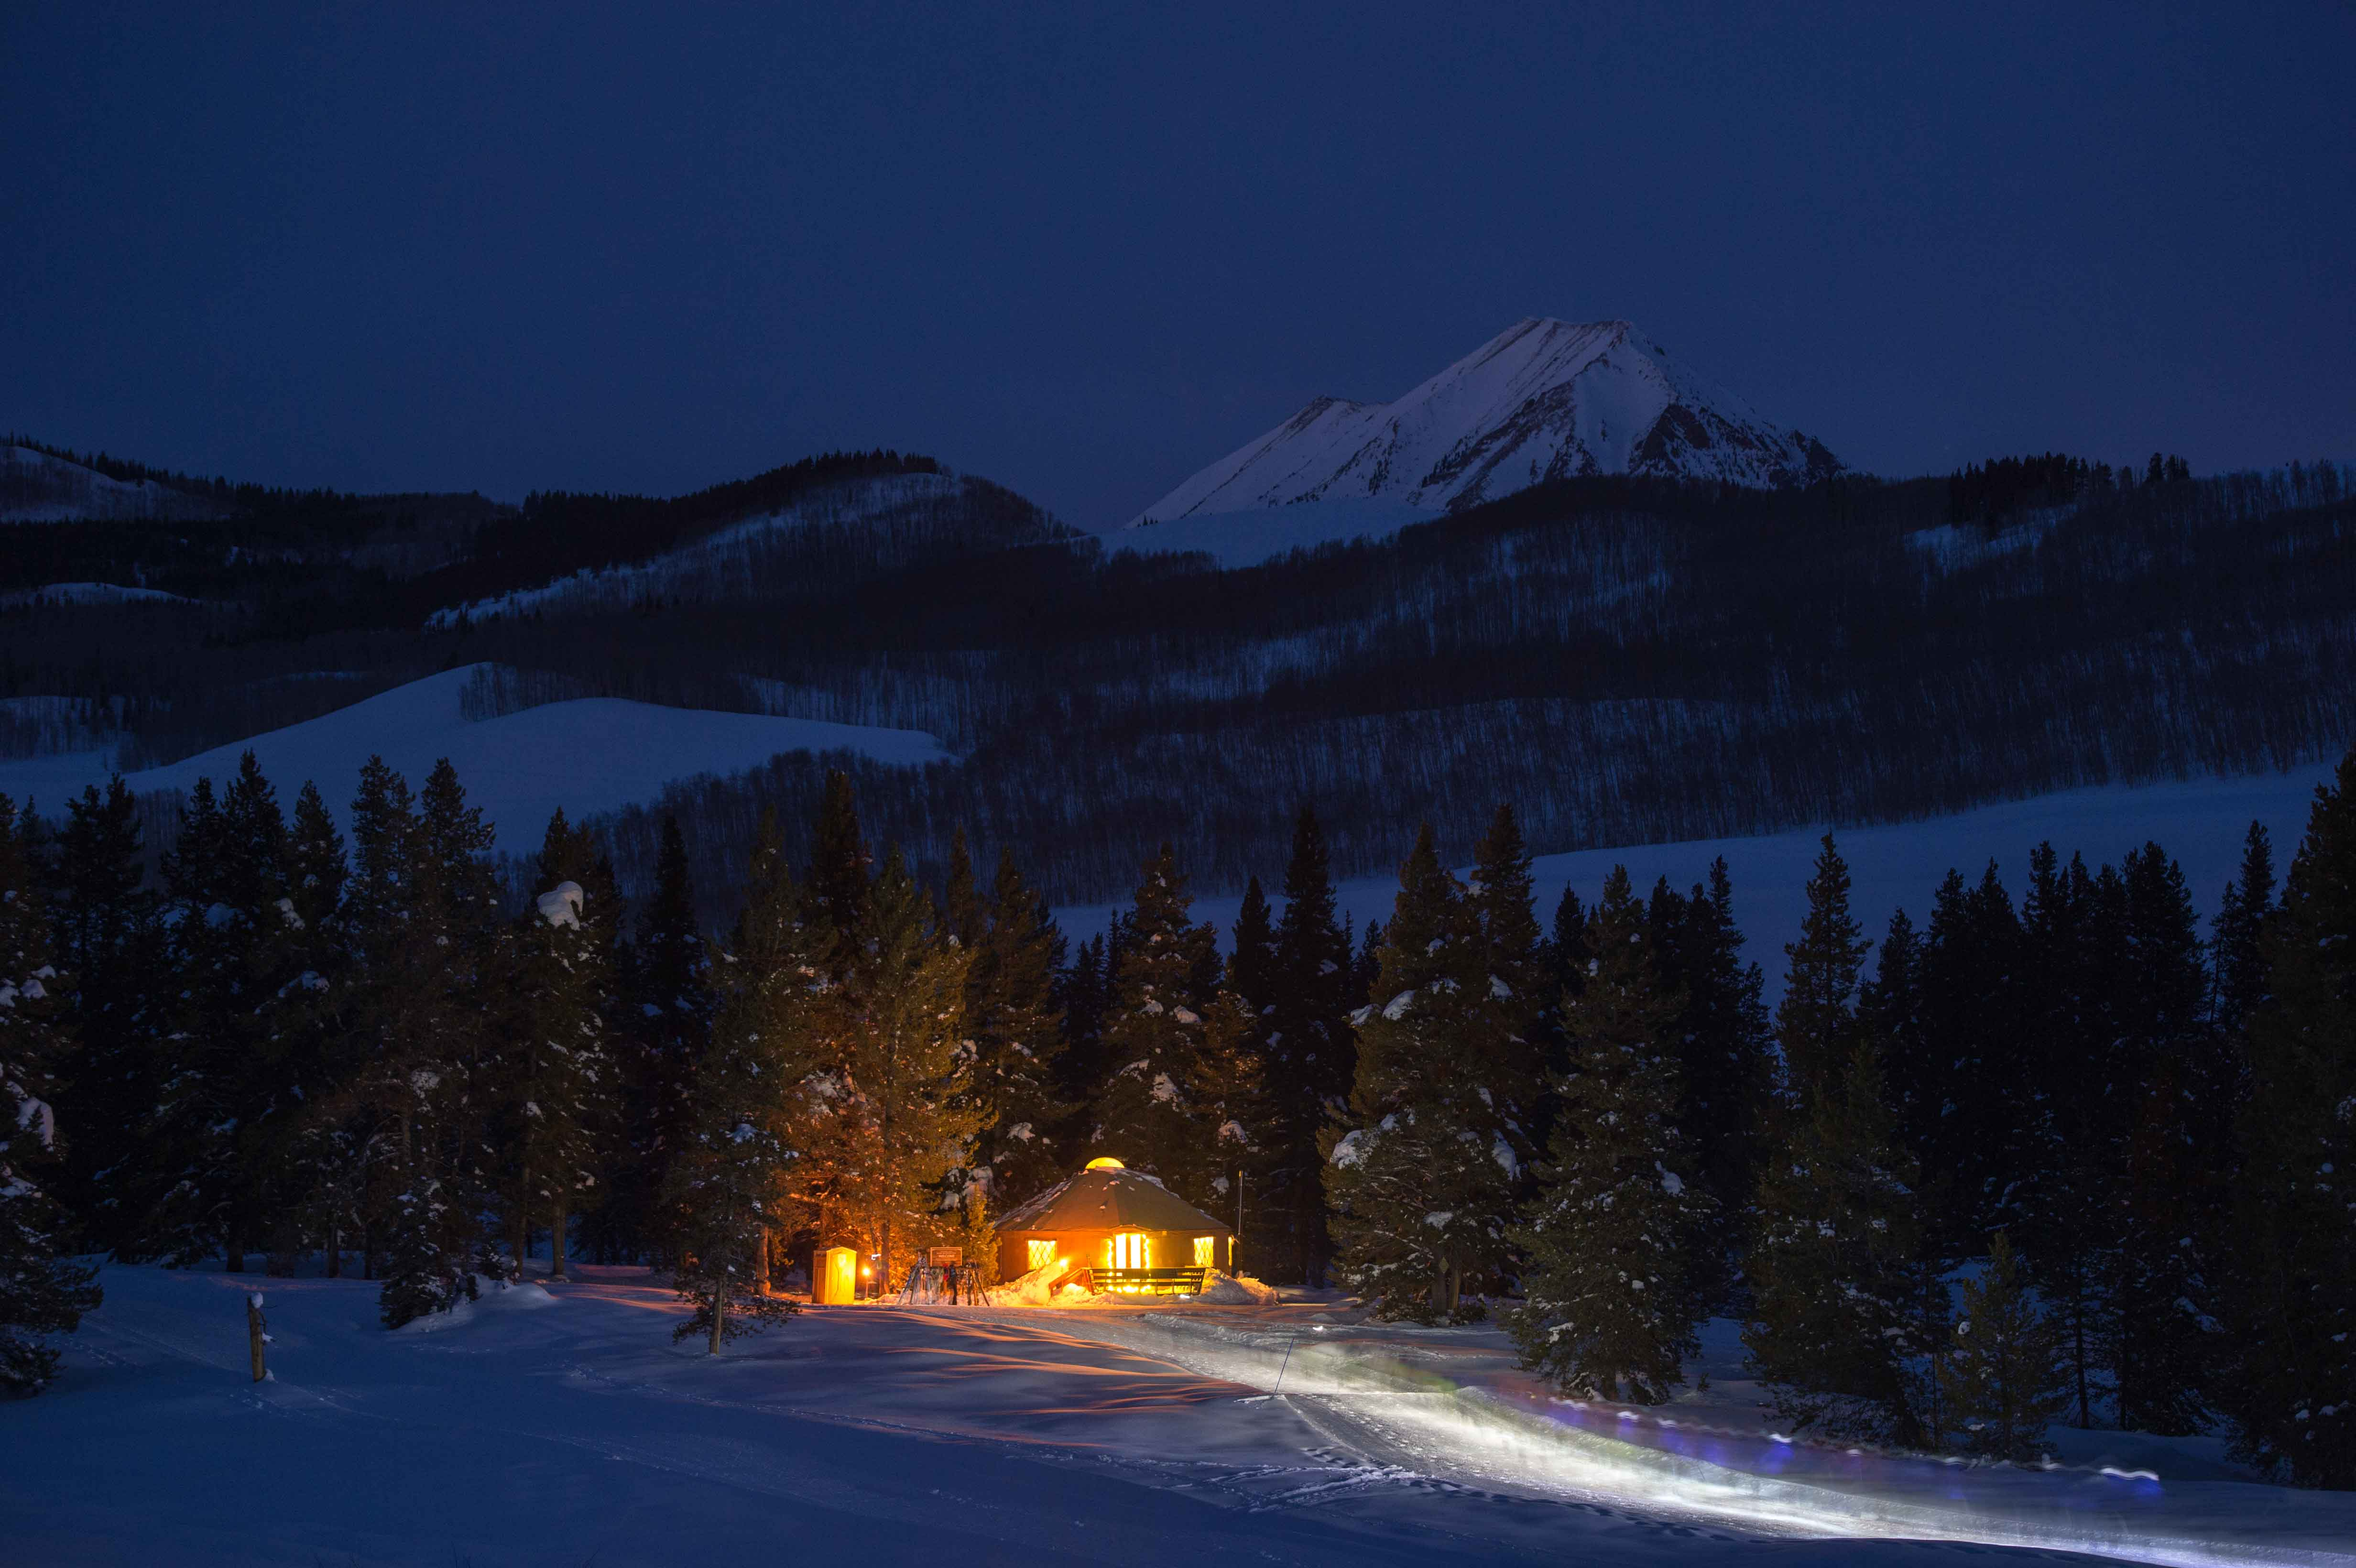 Magic Meadows Yurt Dinner Crested Butte Nordic Nordic Ski Capital Of Colorado